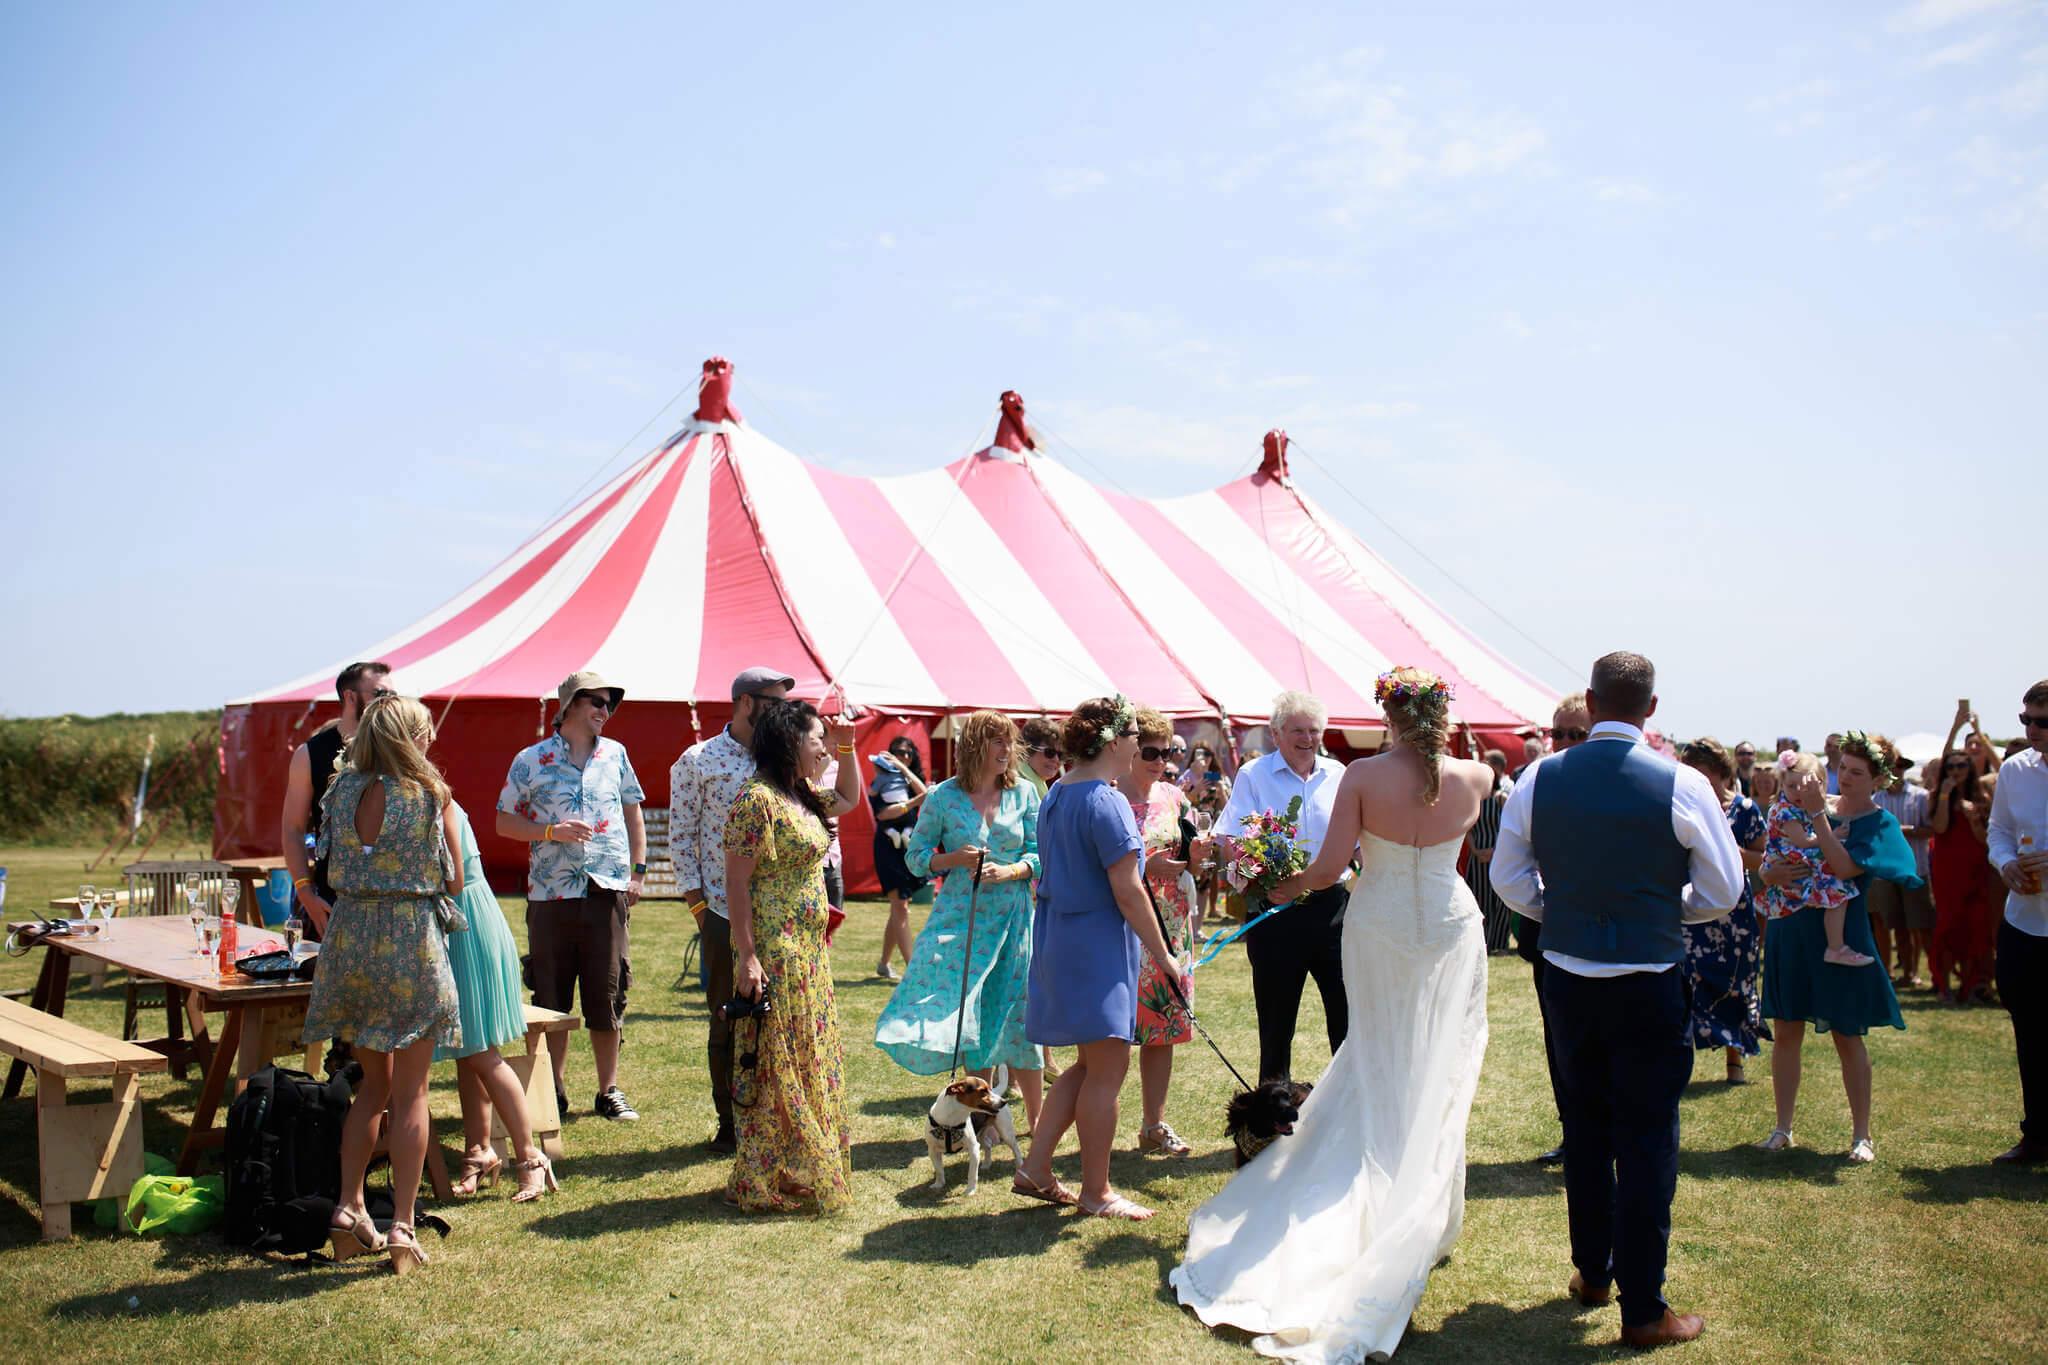 Kernow weddings marquee hire, big-top hire, circus tent rentals